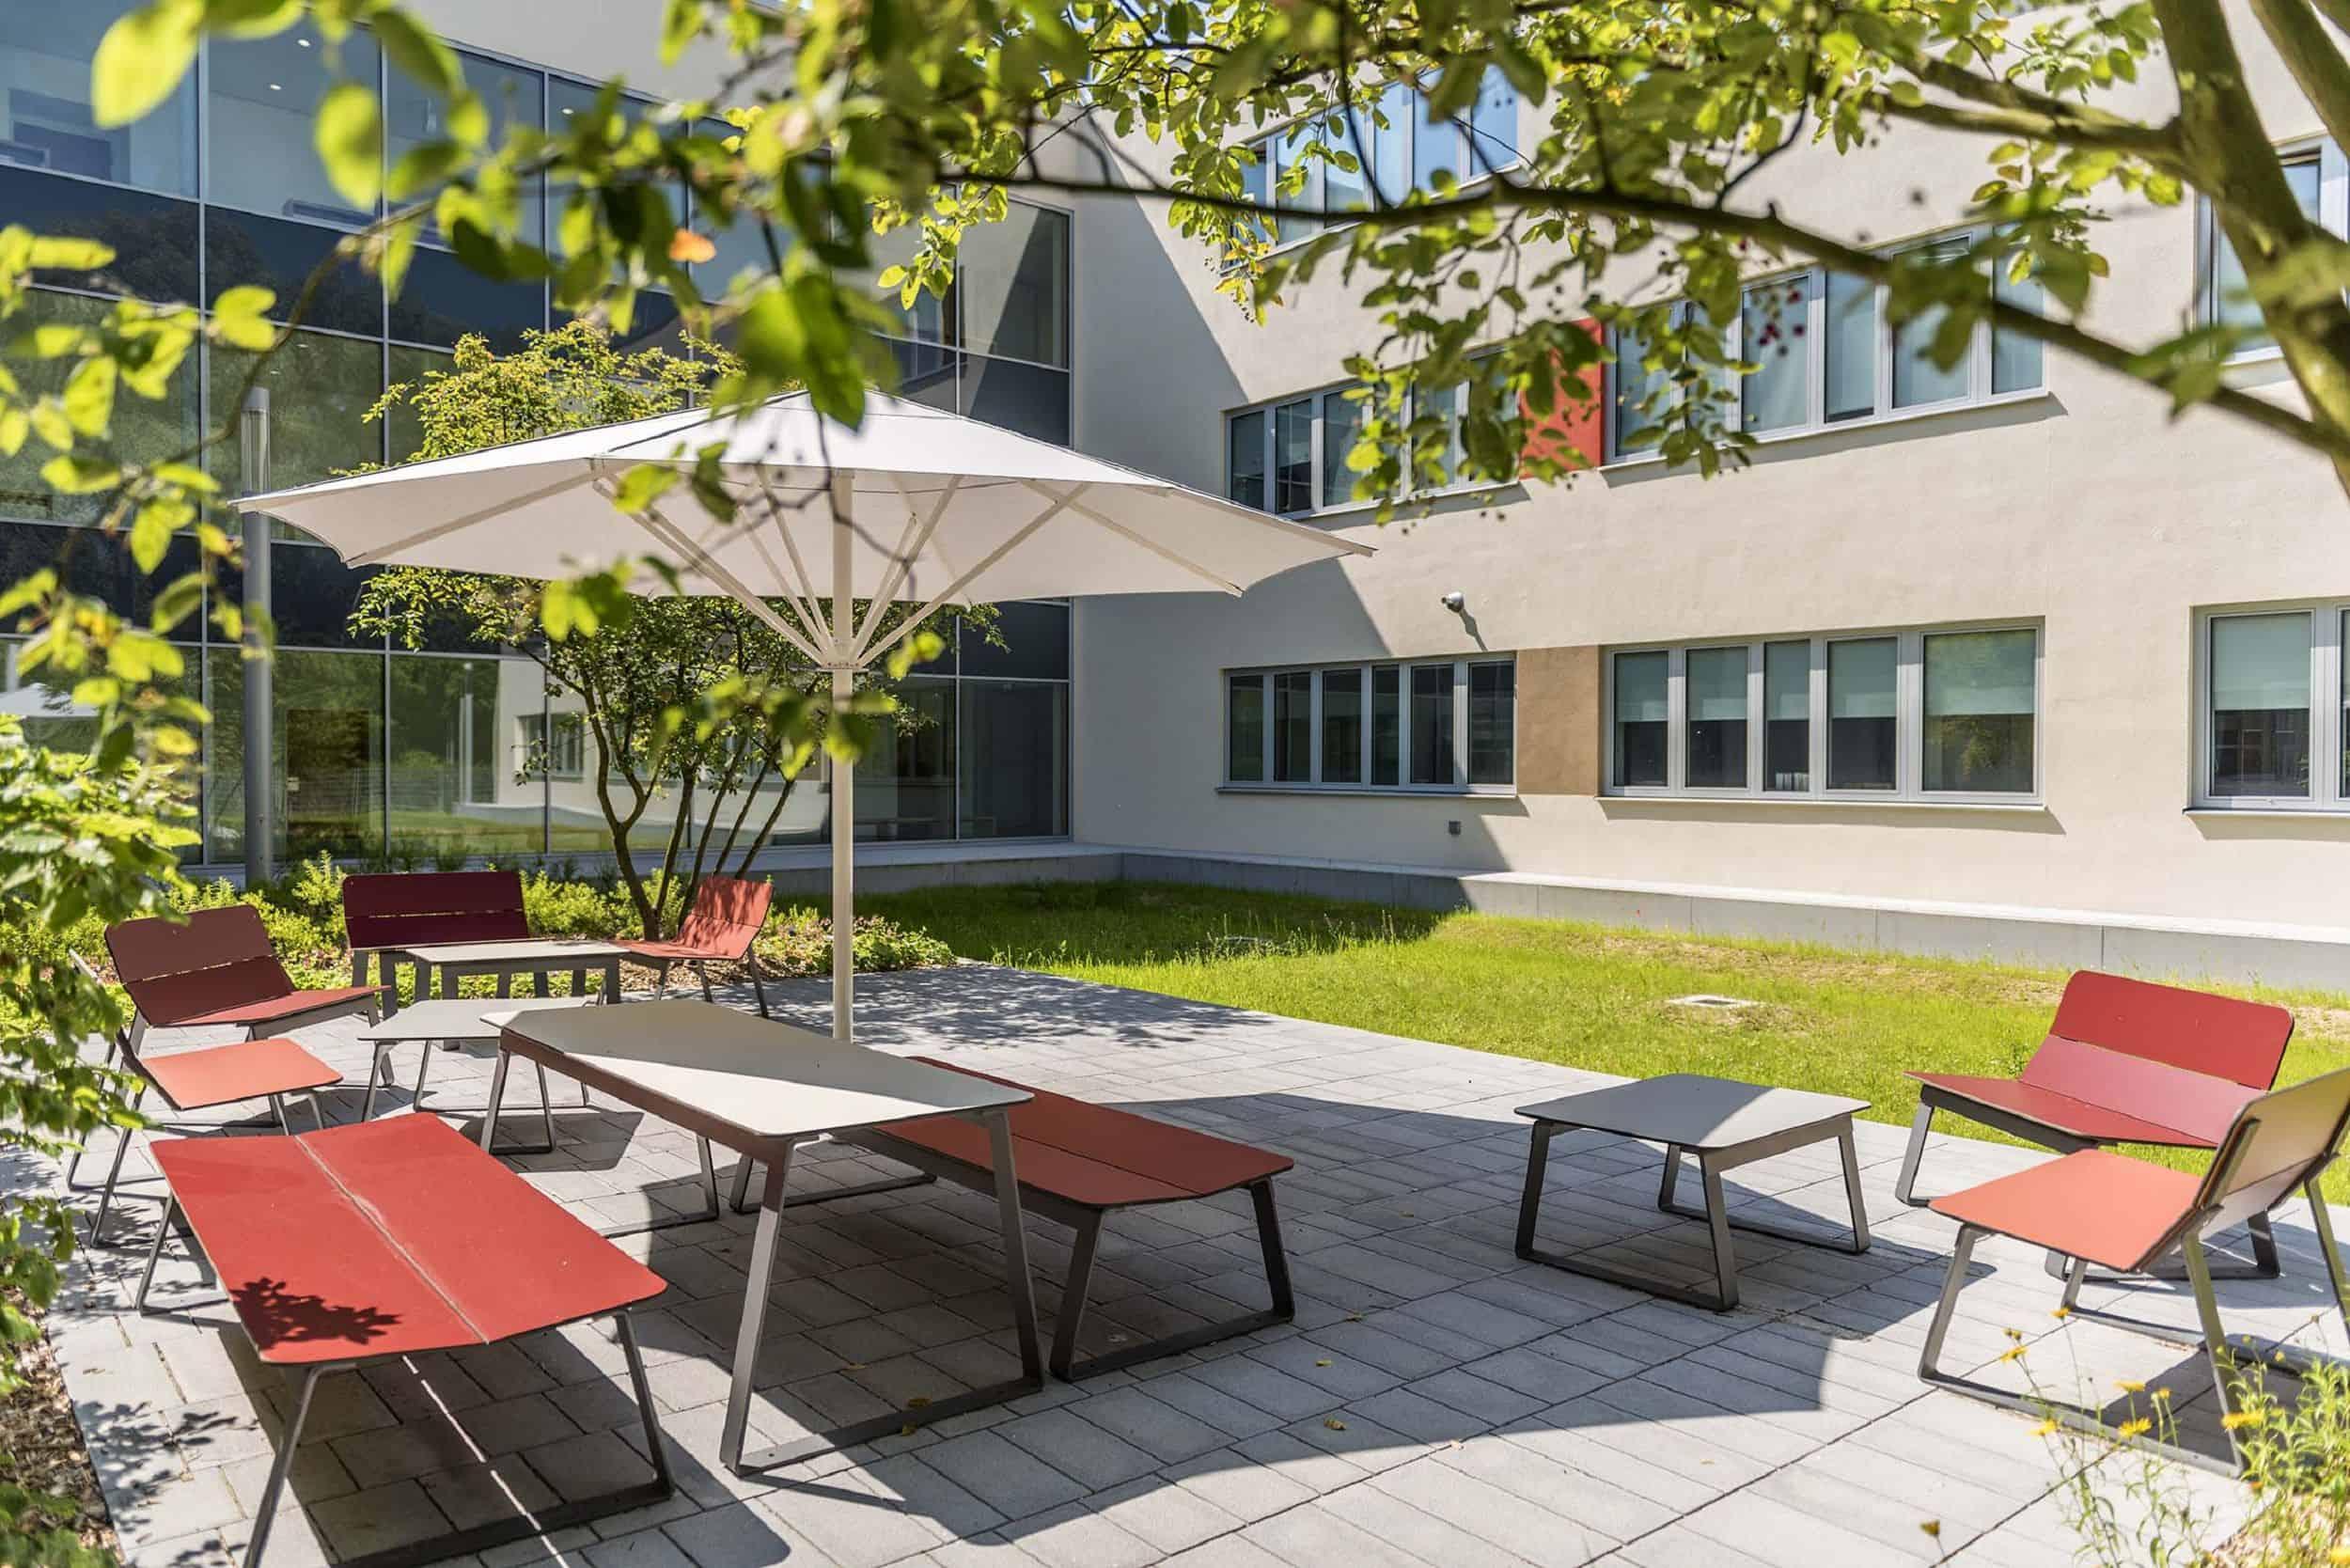 Bild: Lehrerterrasse im Innenhof, Foto: Johann Hinrichs Photography